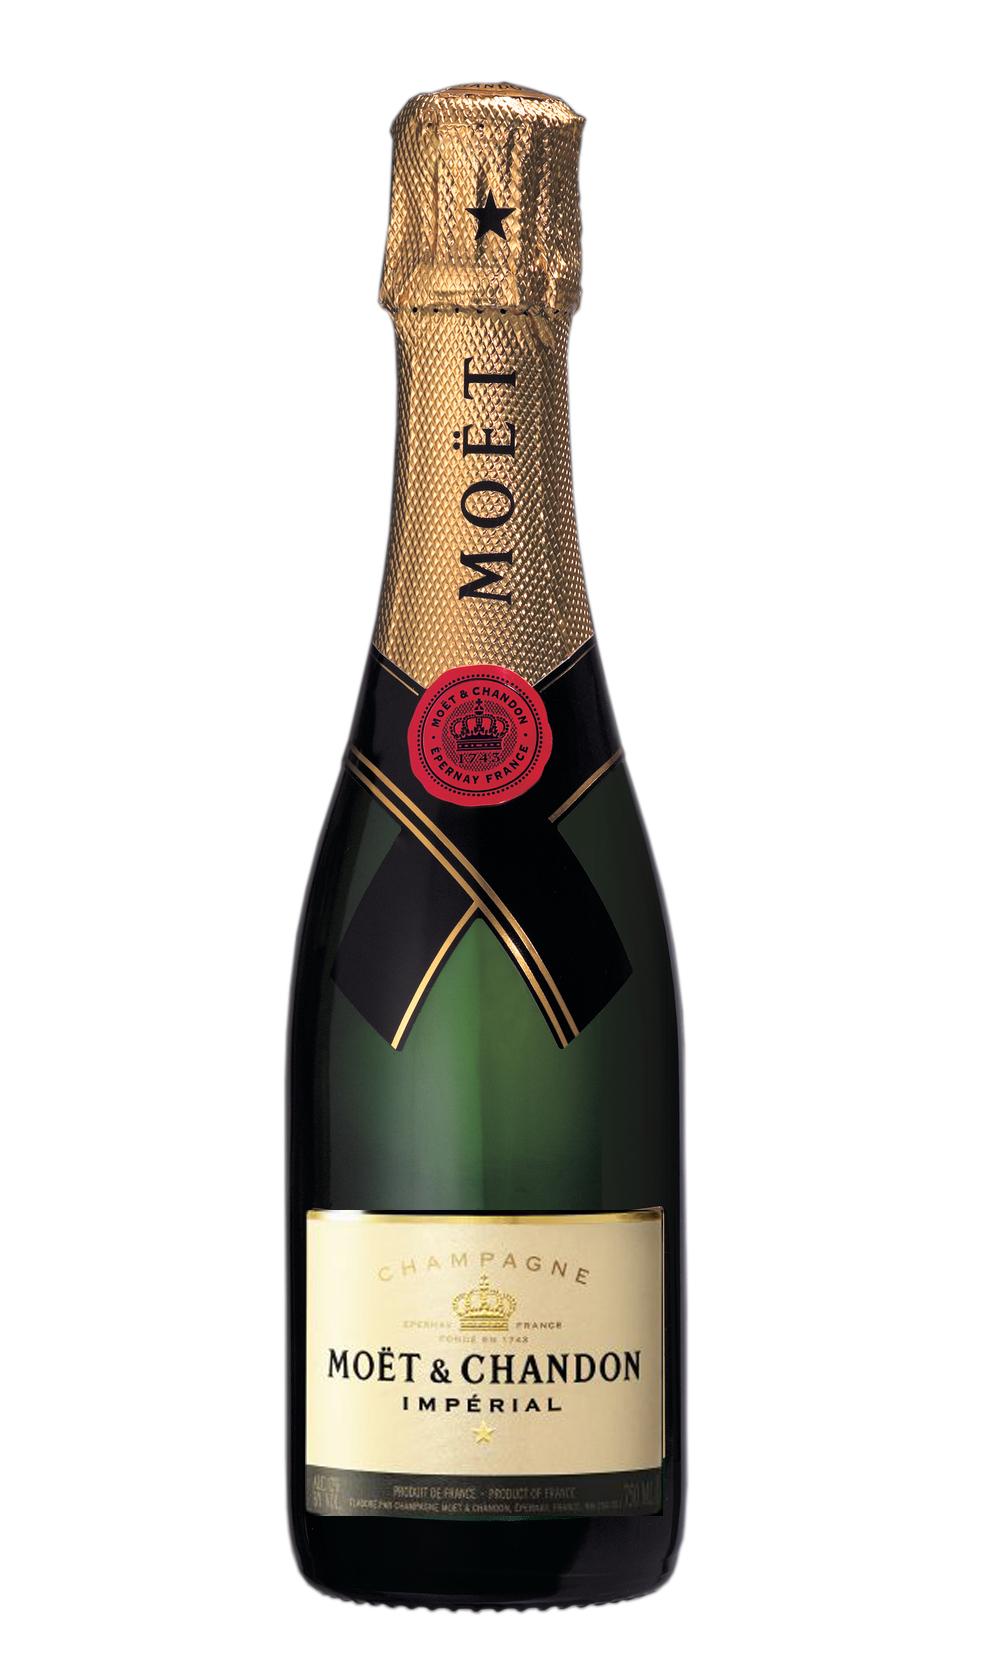 Champagner Moet & Chandon brut 375ml